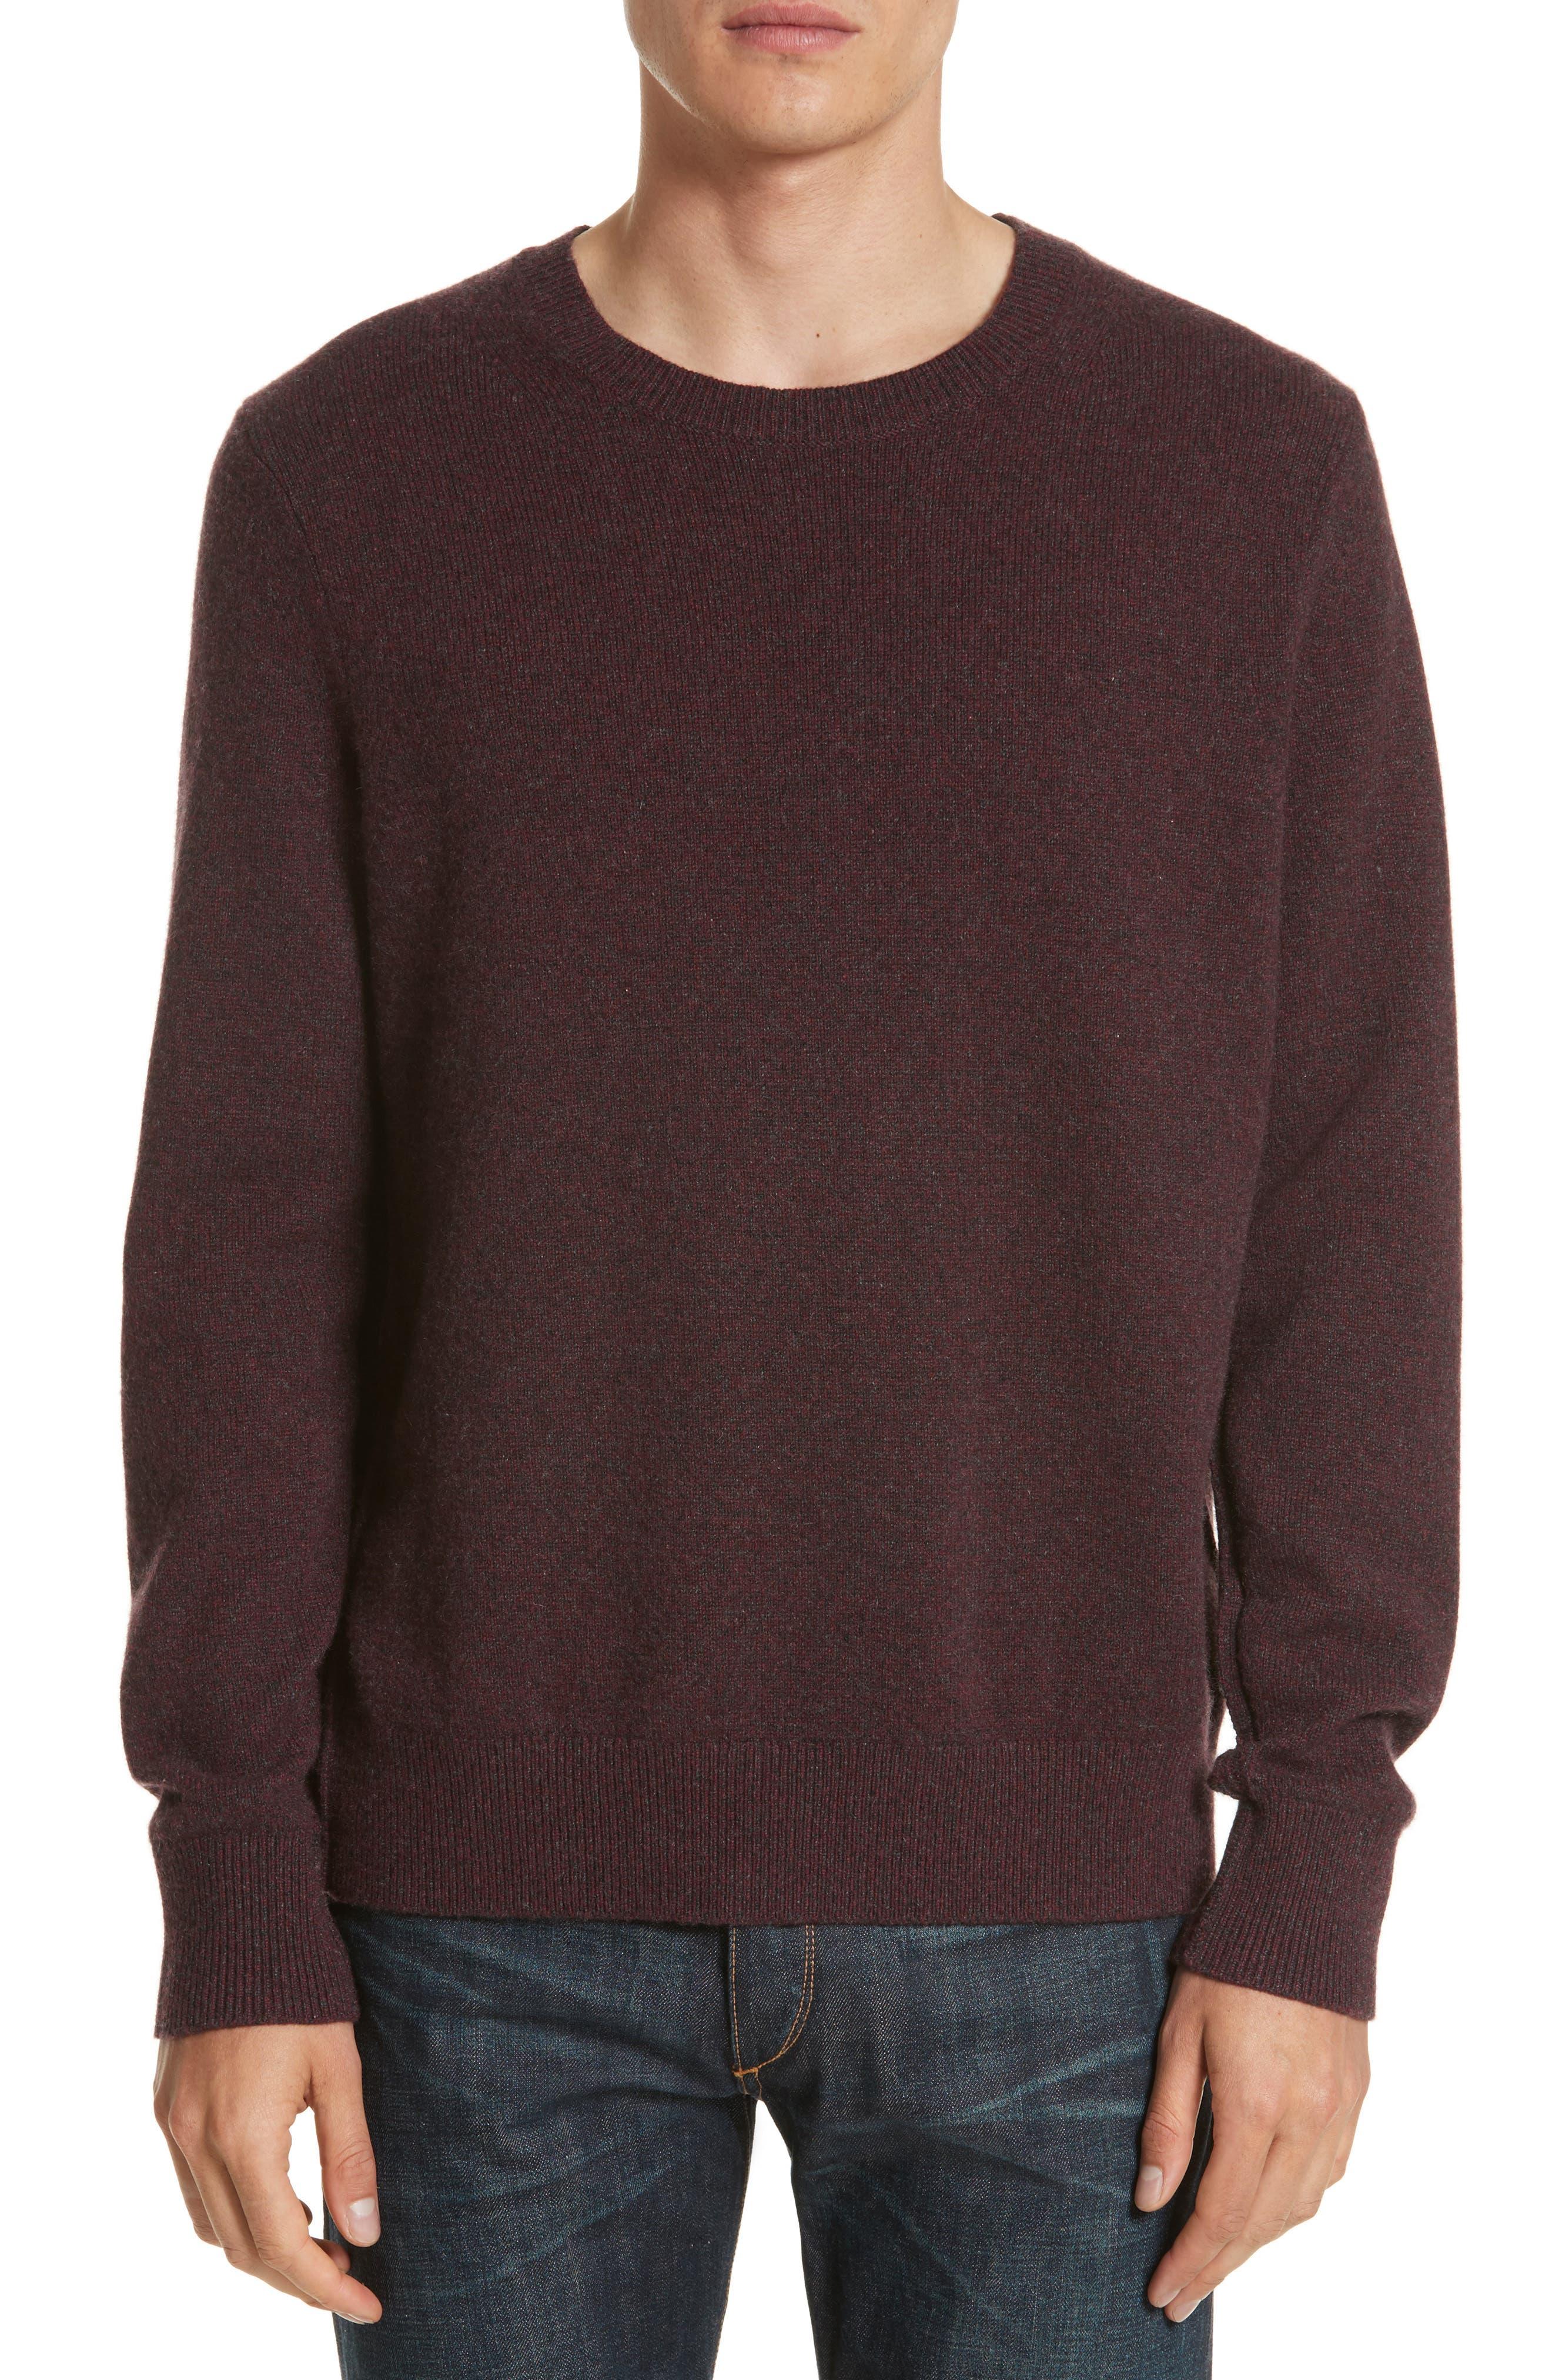 Holdon Cashmere Sweater,                             Main thumbnail 1, color,                             Burgundy